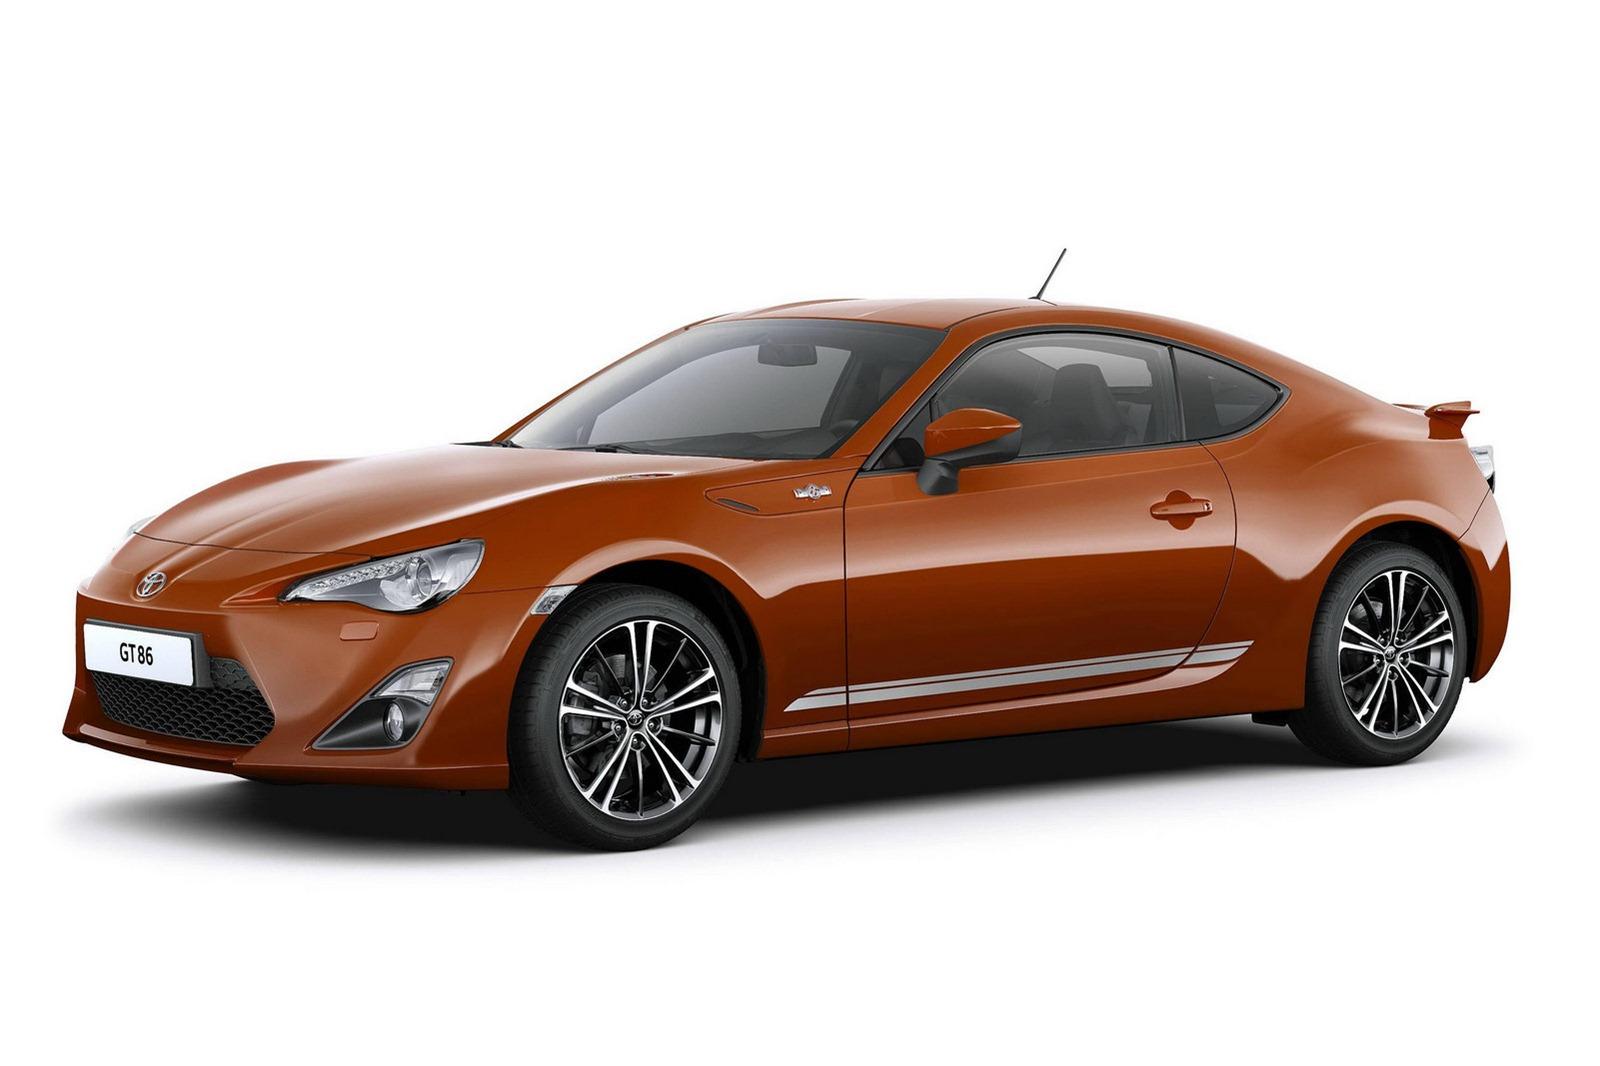 https://3.bp.blogspot.com/-pQ3UwTimXlQ/UAbriZKczNI/AAAAAAAAC9E/fb1YoYAgaTA/s1600/New_Toyota_gt_86_Orange_HD_Wallpaper-CarWallBase.Blogspot.Com-.jpg